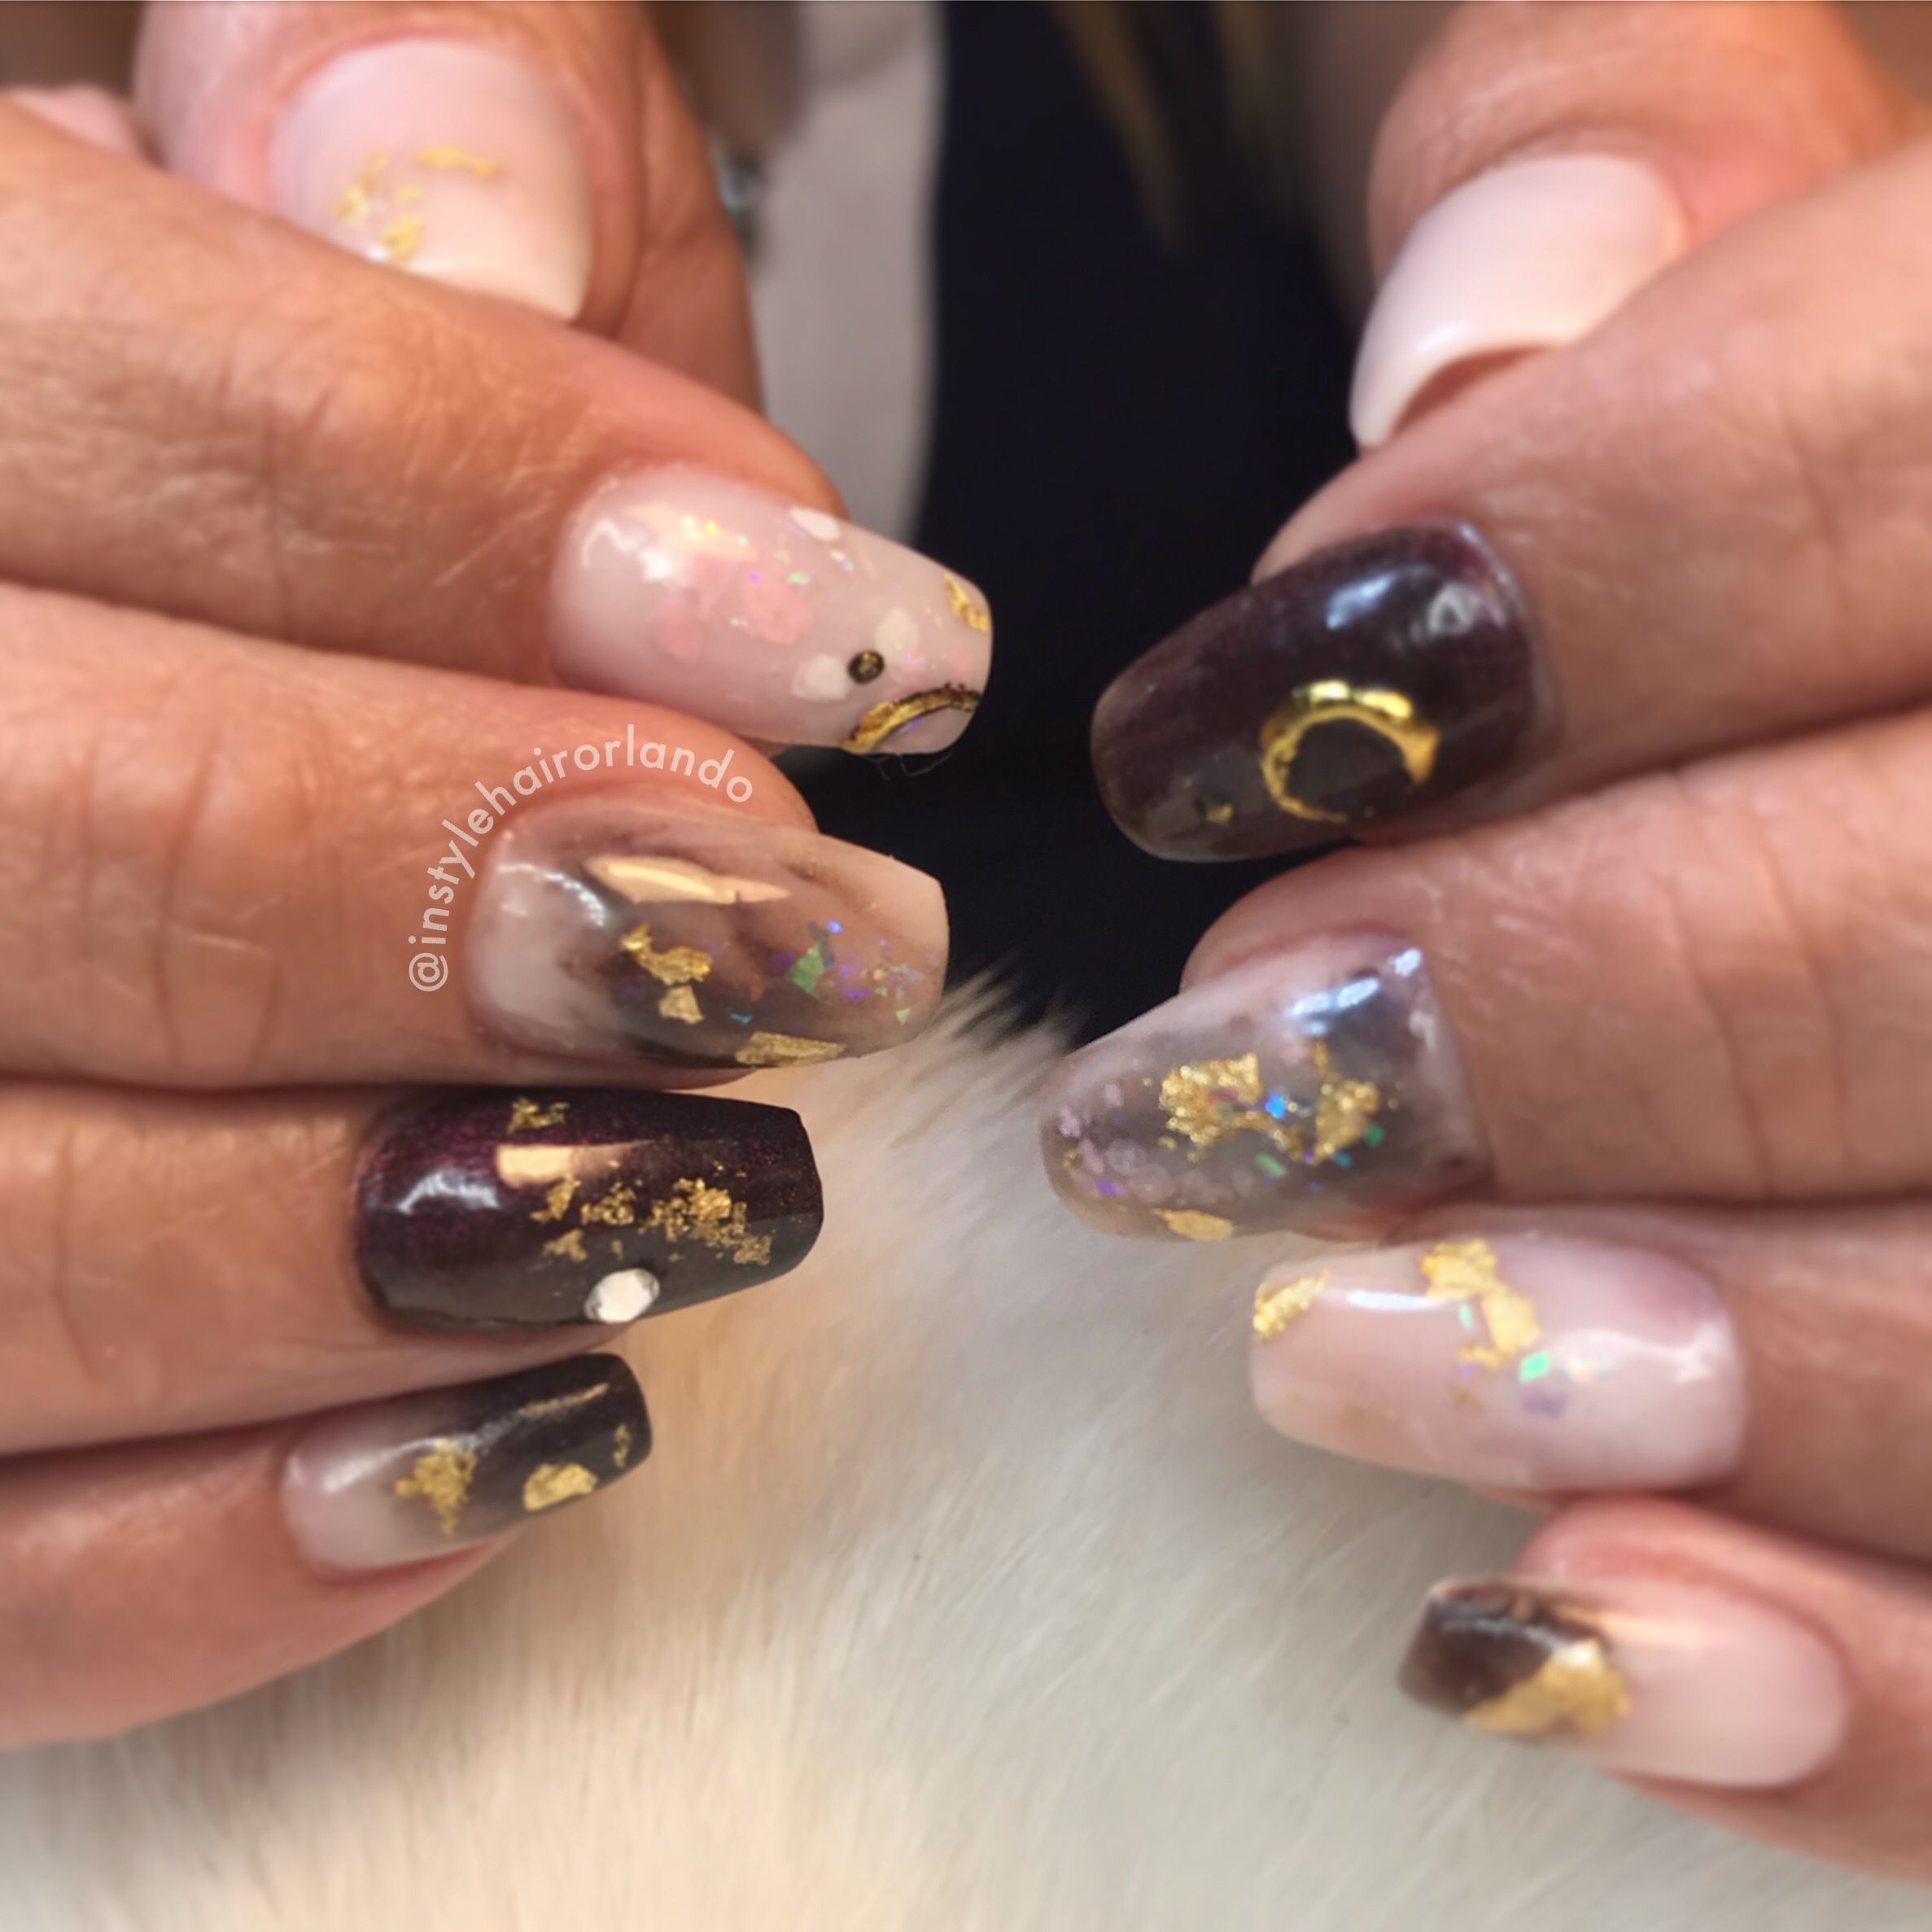 Nails By Wi At In Style Baldwin Park Orlando Fl Follow Us On Instagram Instylehairorlando Instylehairorlando Eyelash Tinting Gel Manicure Eyebrow Tinting